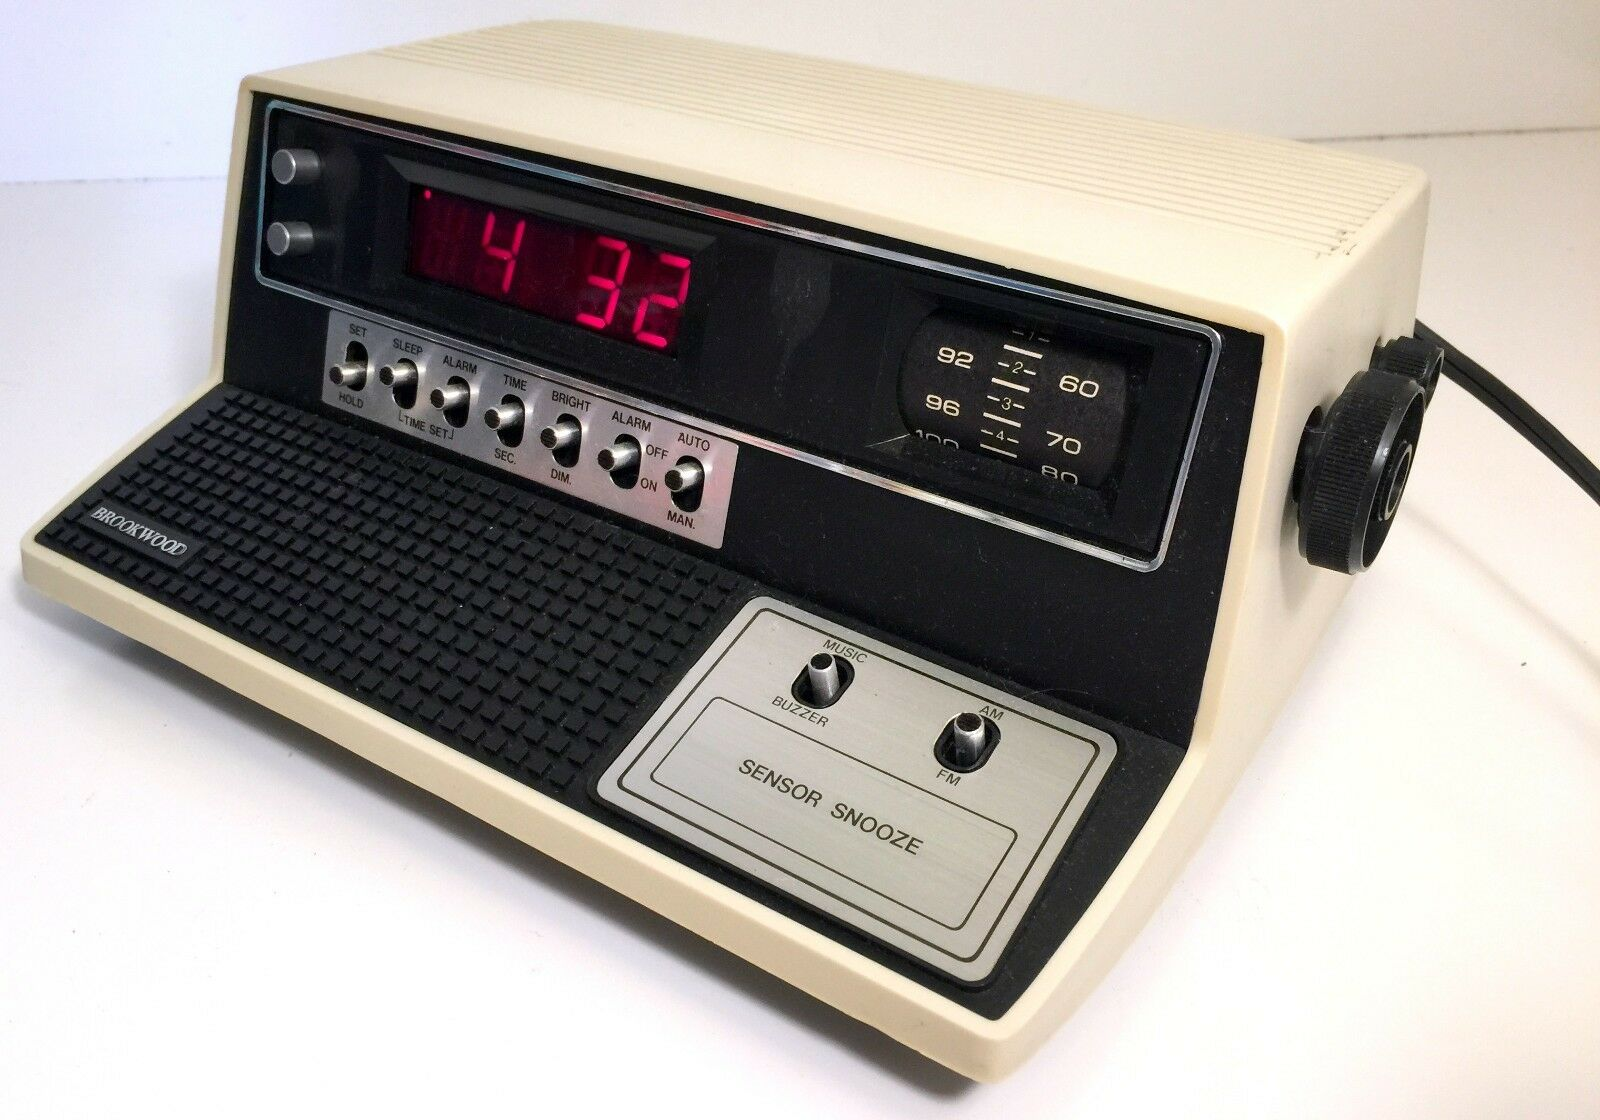 Digital Brookwood Alarm Clock Radio 7002  with Compu Readout and Sensor Snooze